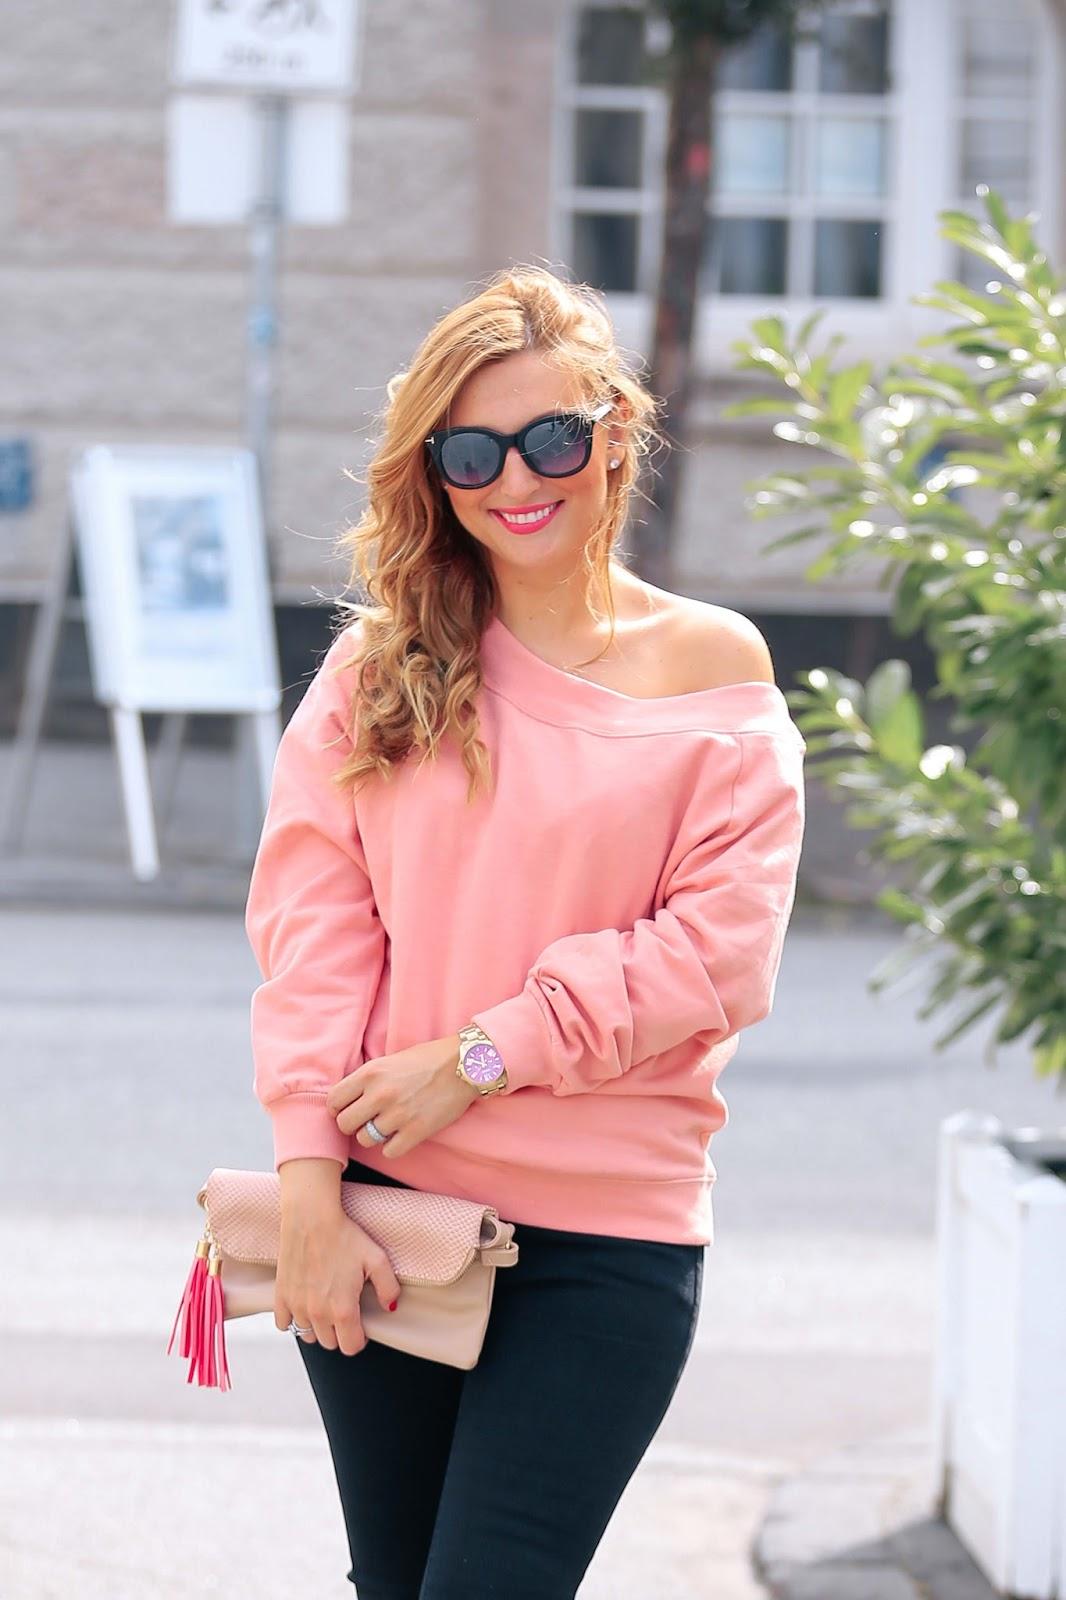 casual-blogger-style-schwarze-jenas-rosa-pulli-fashionstylebyjohanna-blogger-aus-frankfurt